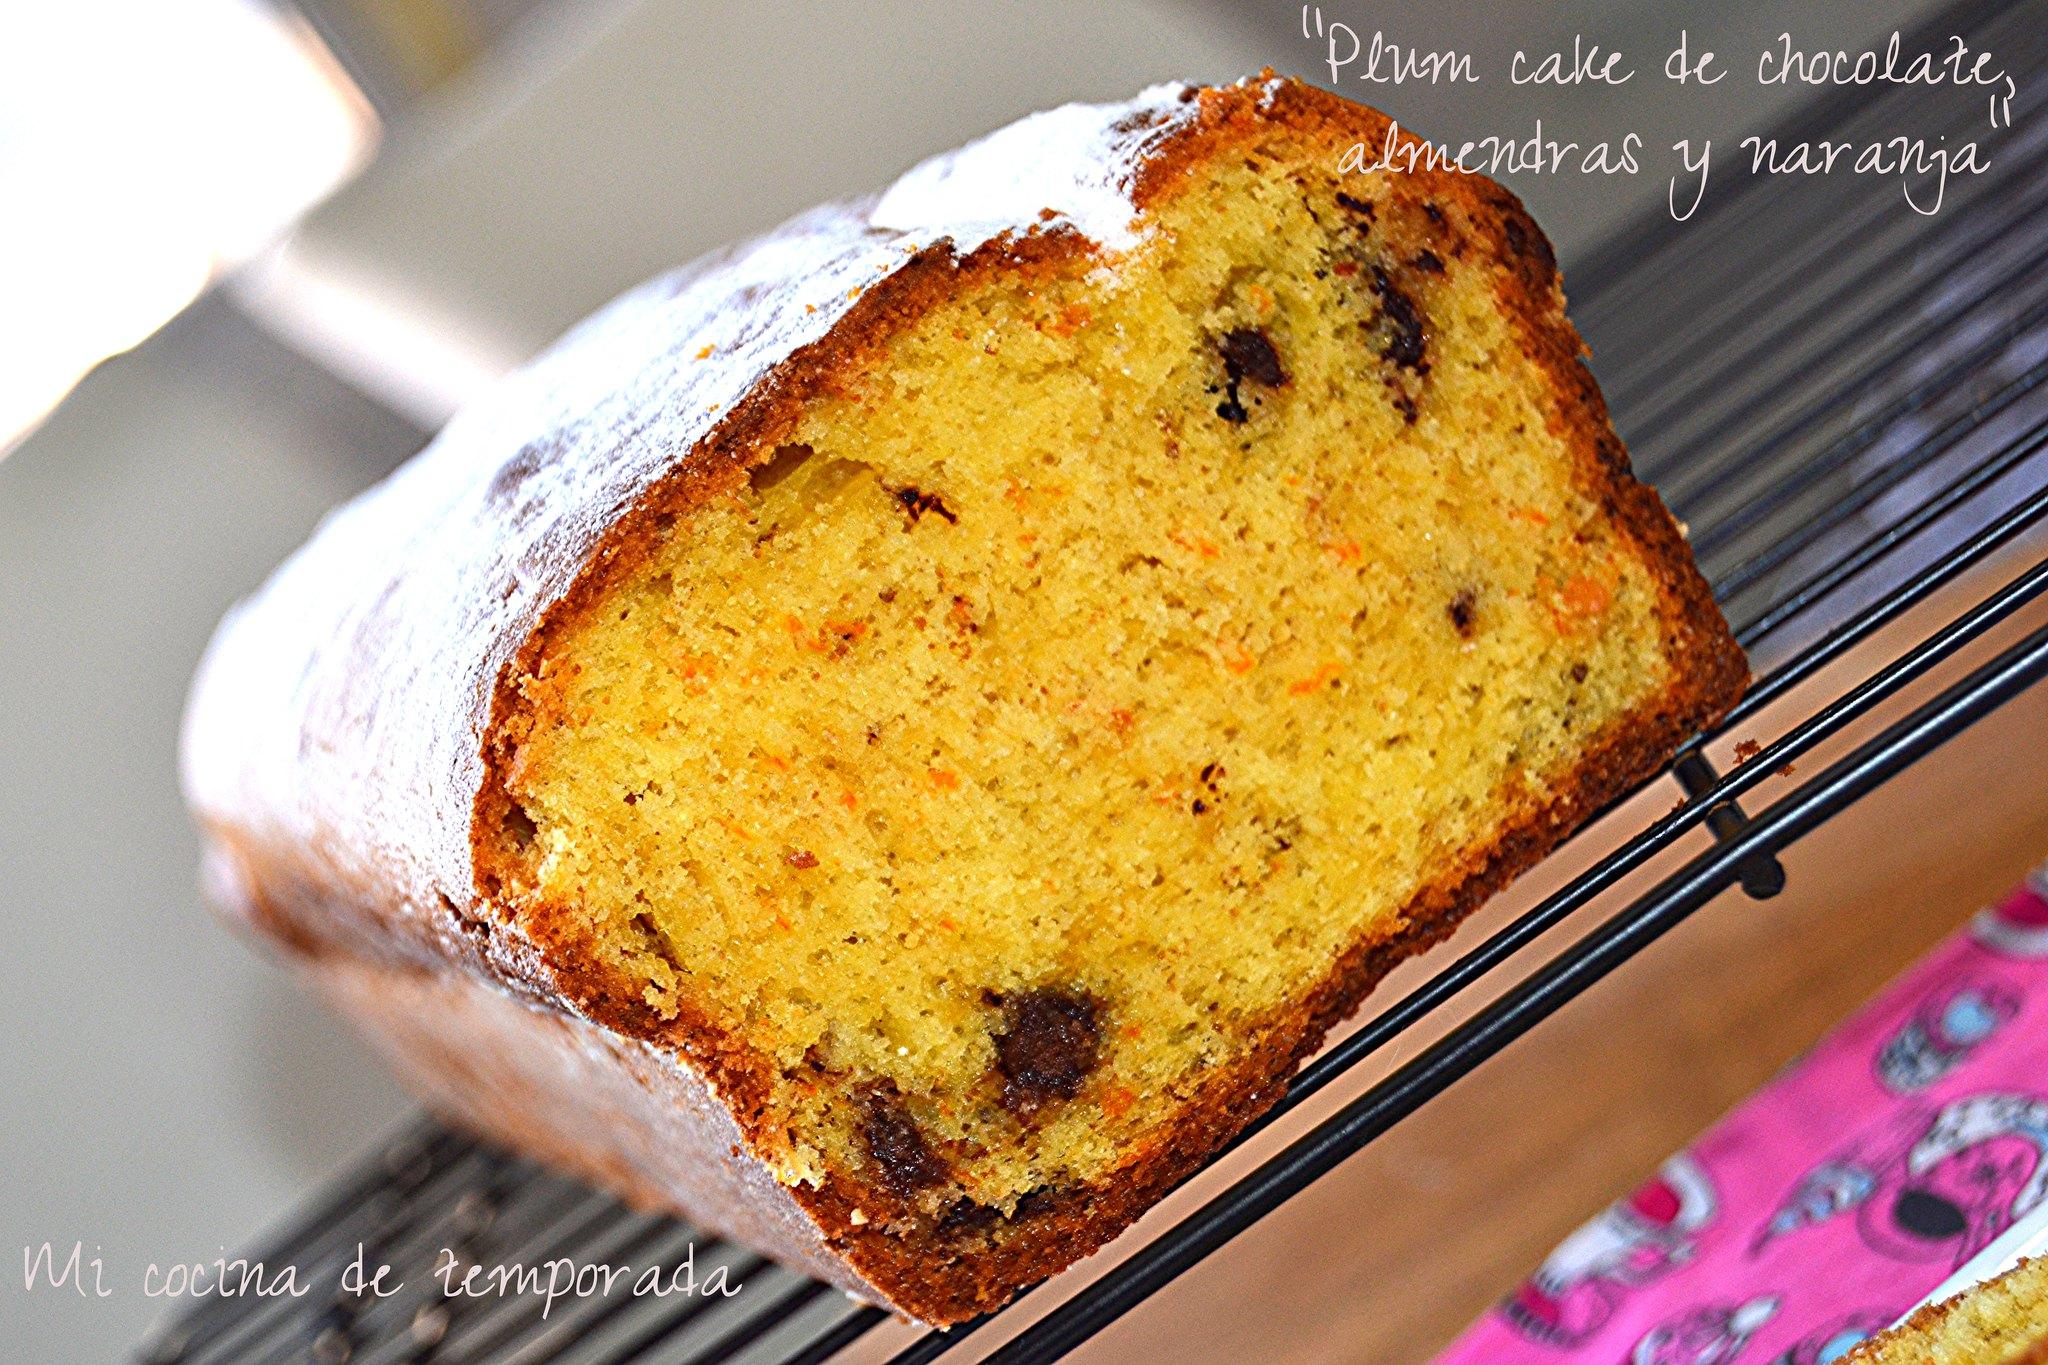 Plum cake ch, al, na 009